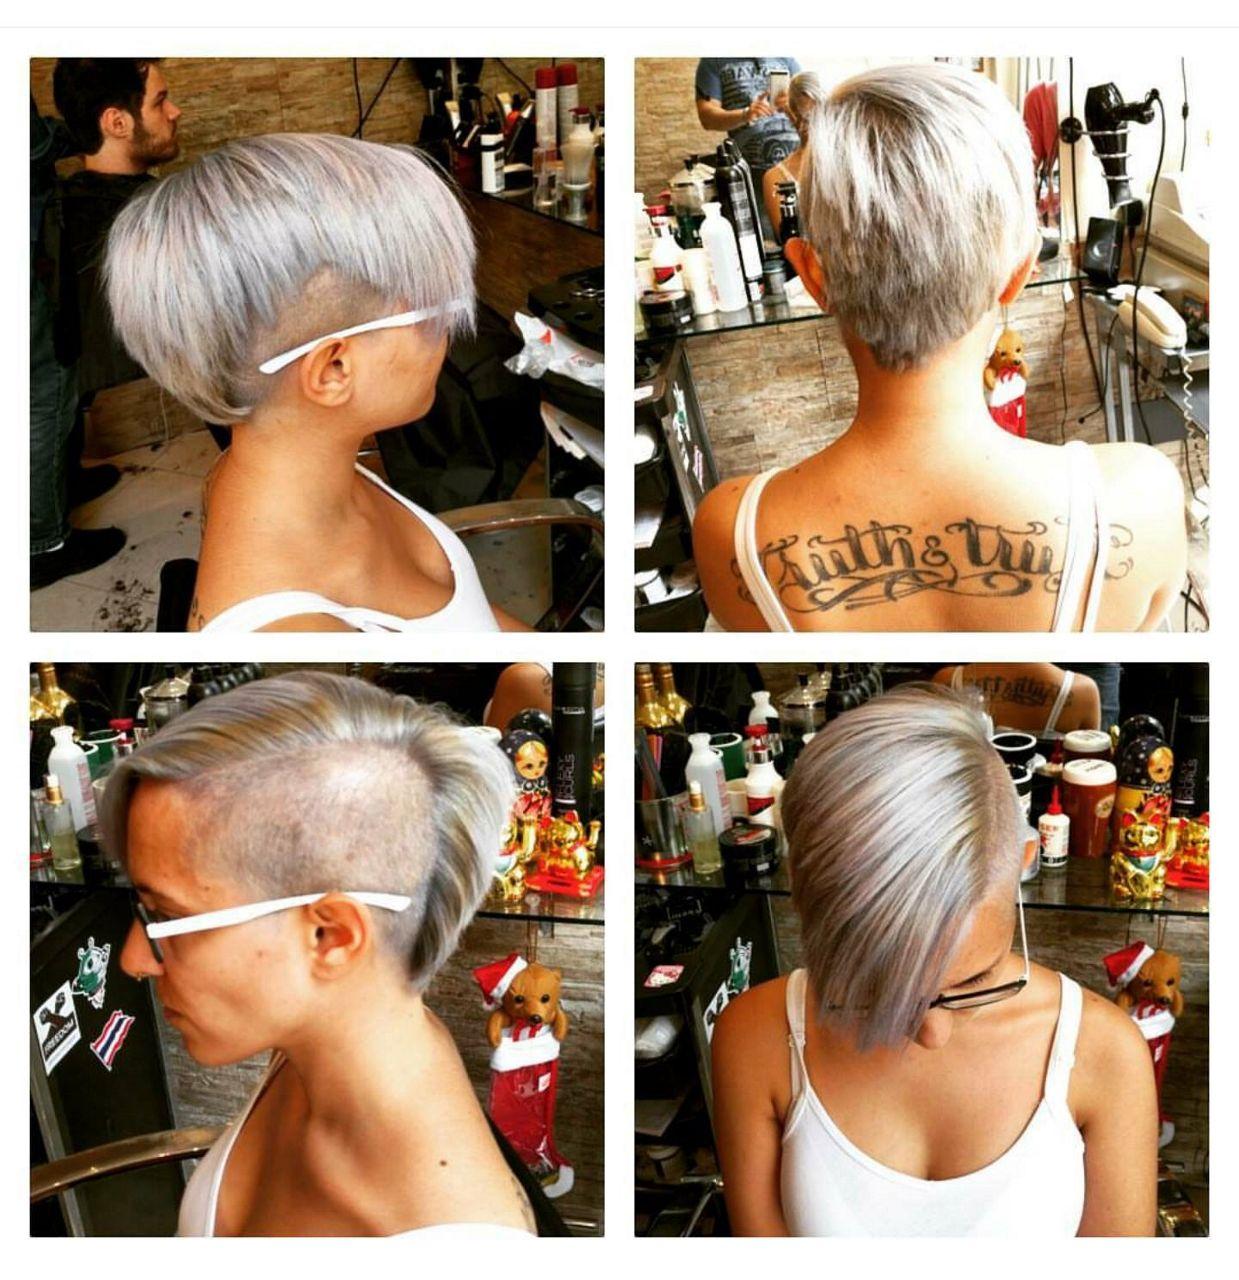 פלאנט X של מעצב השיער אייל שקד